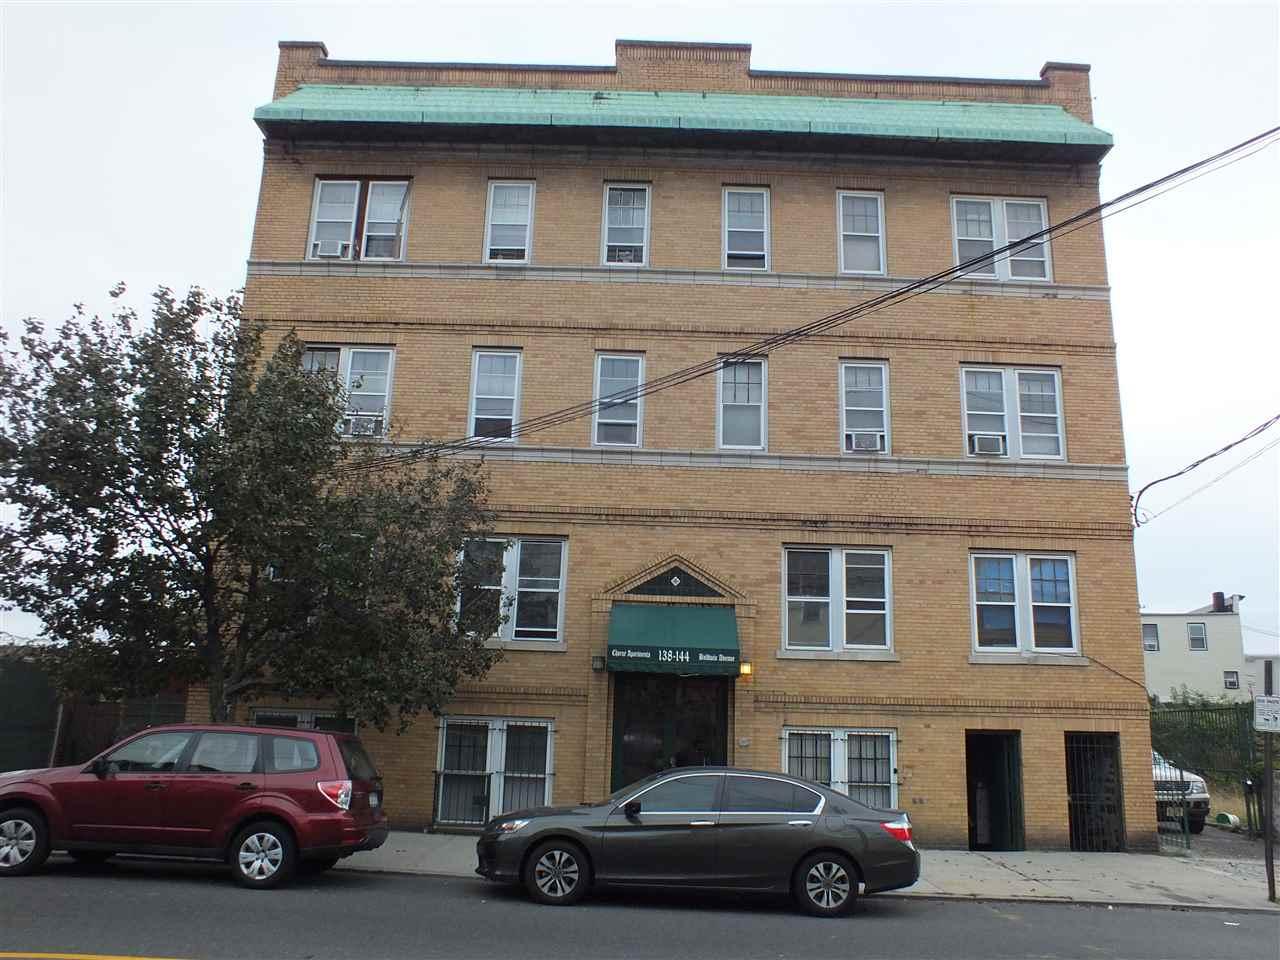 138 BALDWIN AVE 24, JC, Journal Square, NJ 07306